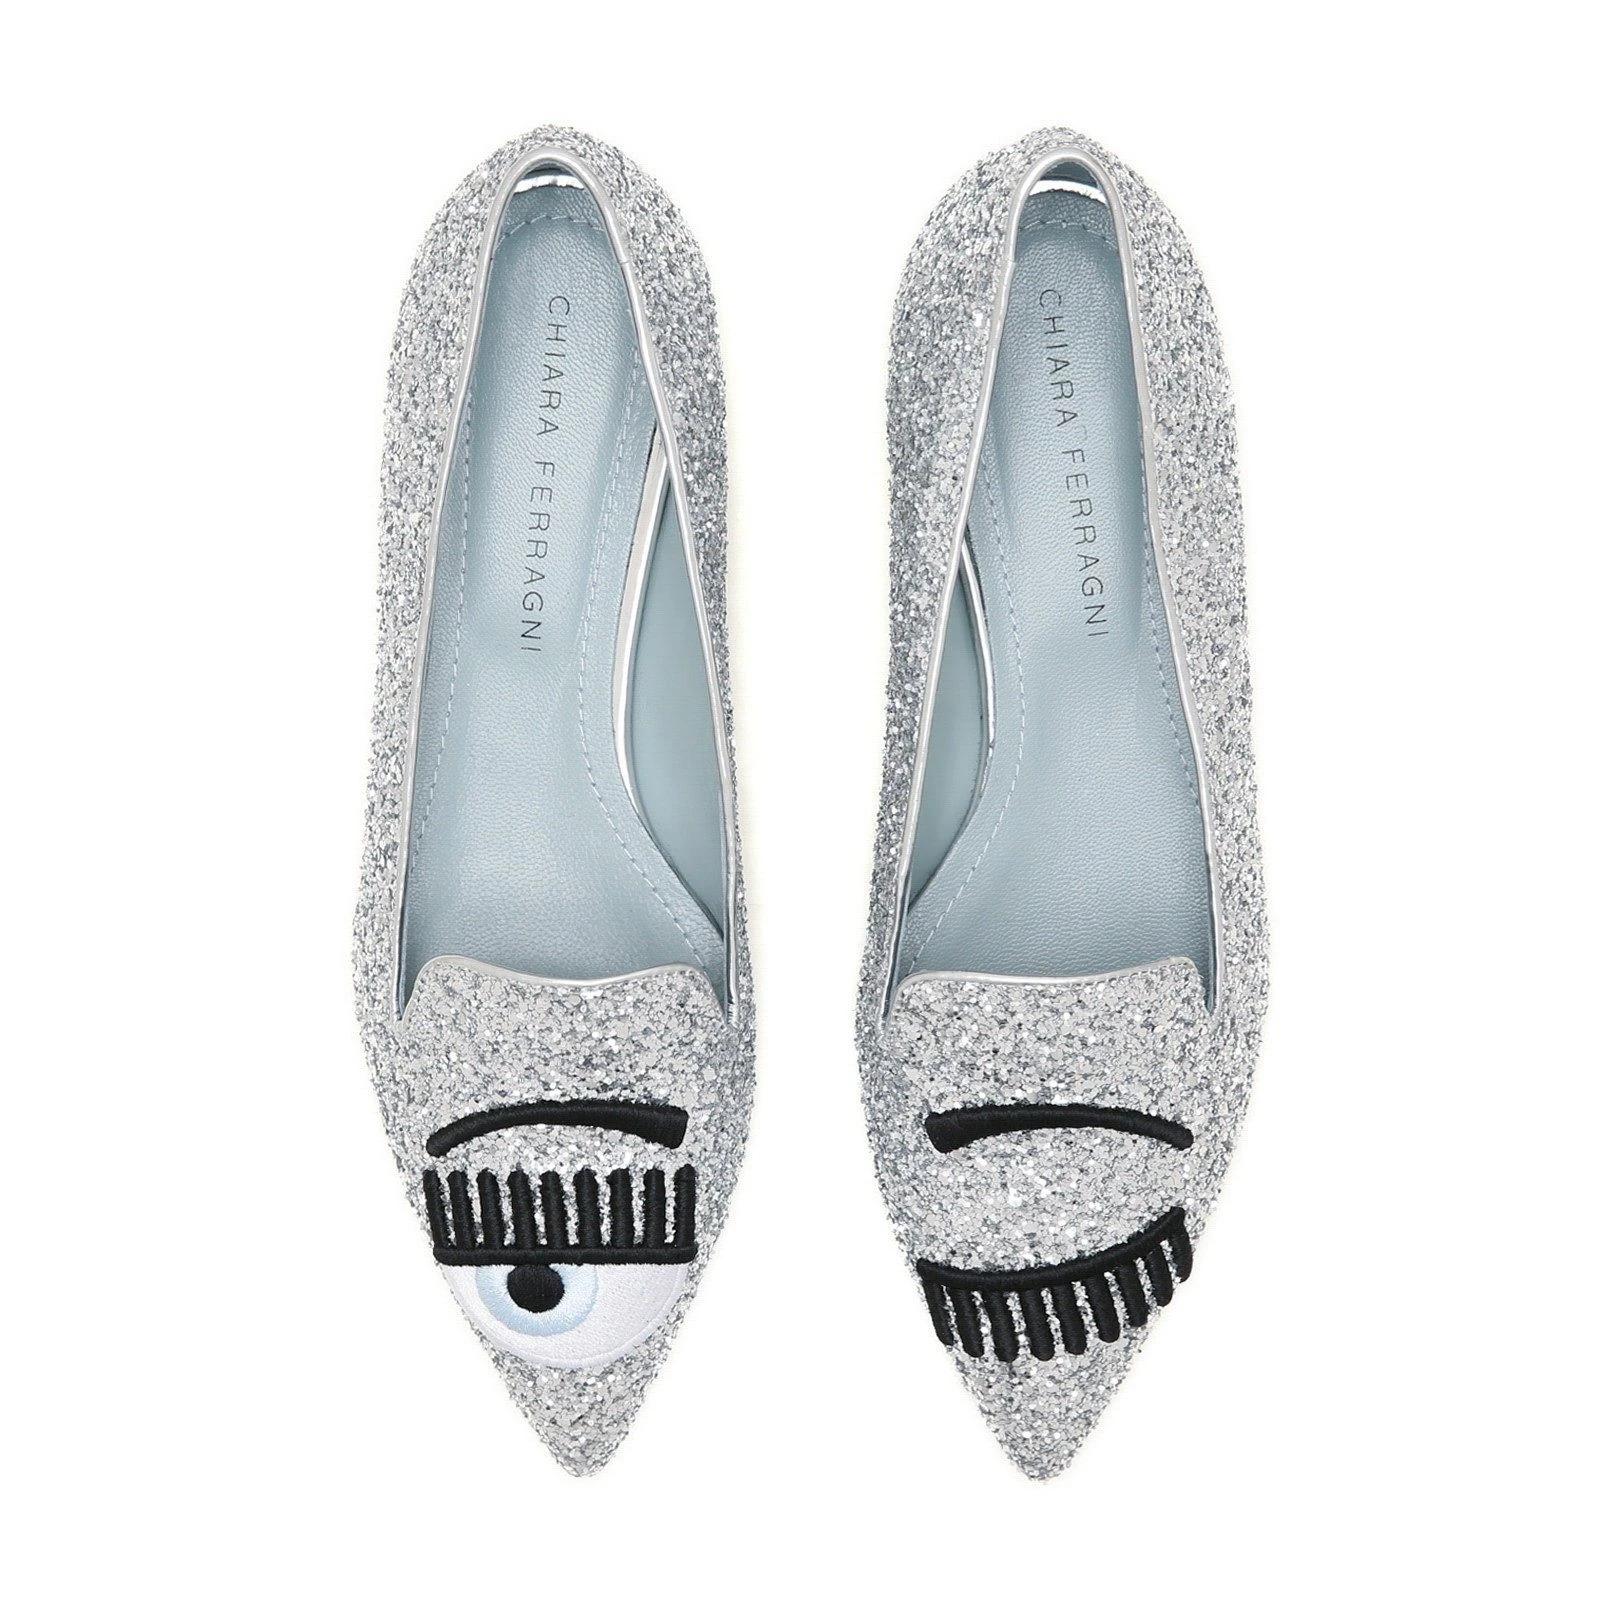 Chiara Ferragni flirting slippers